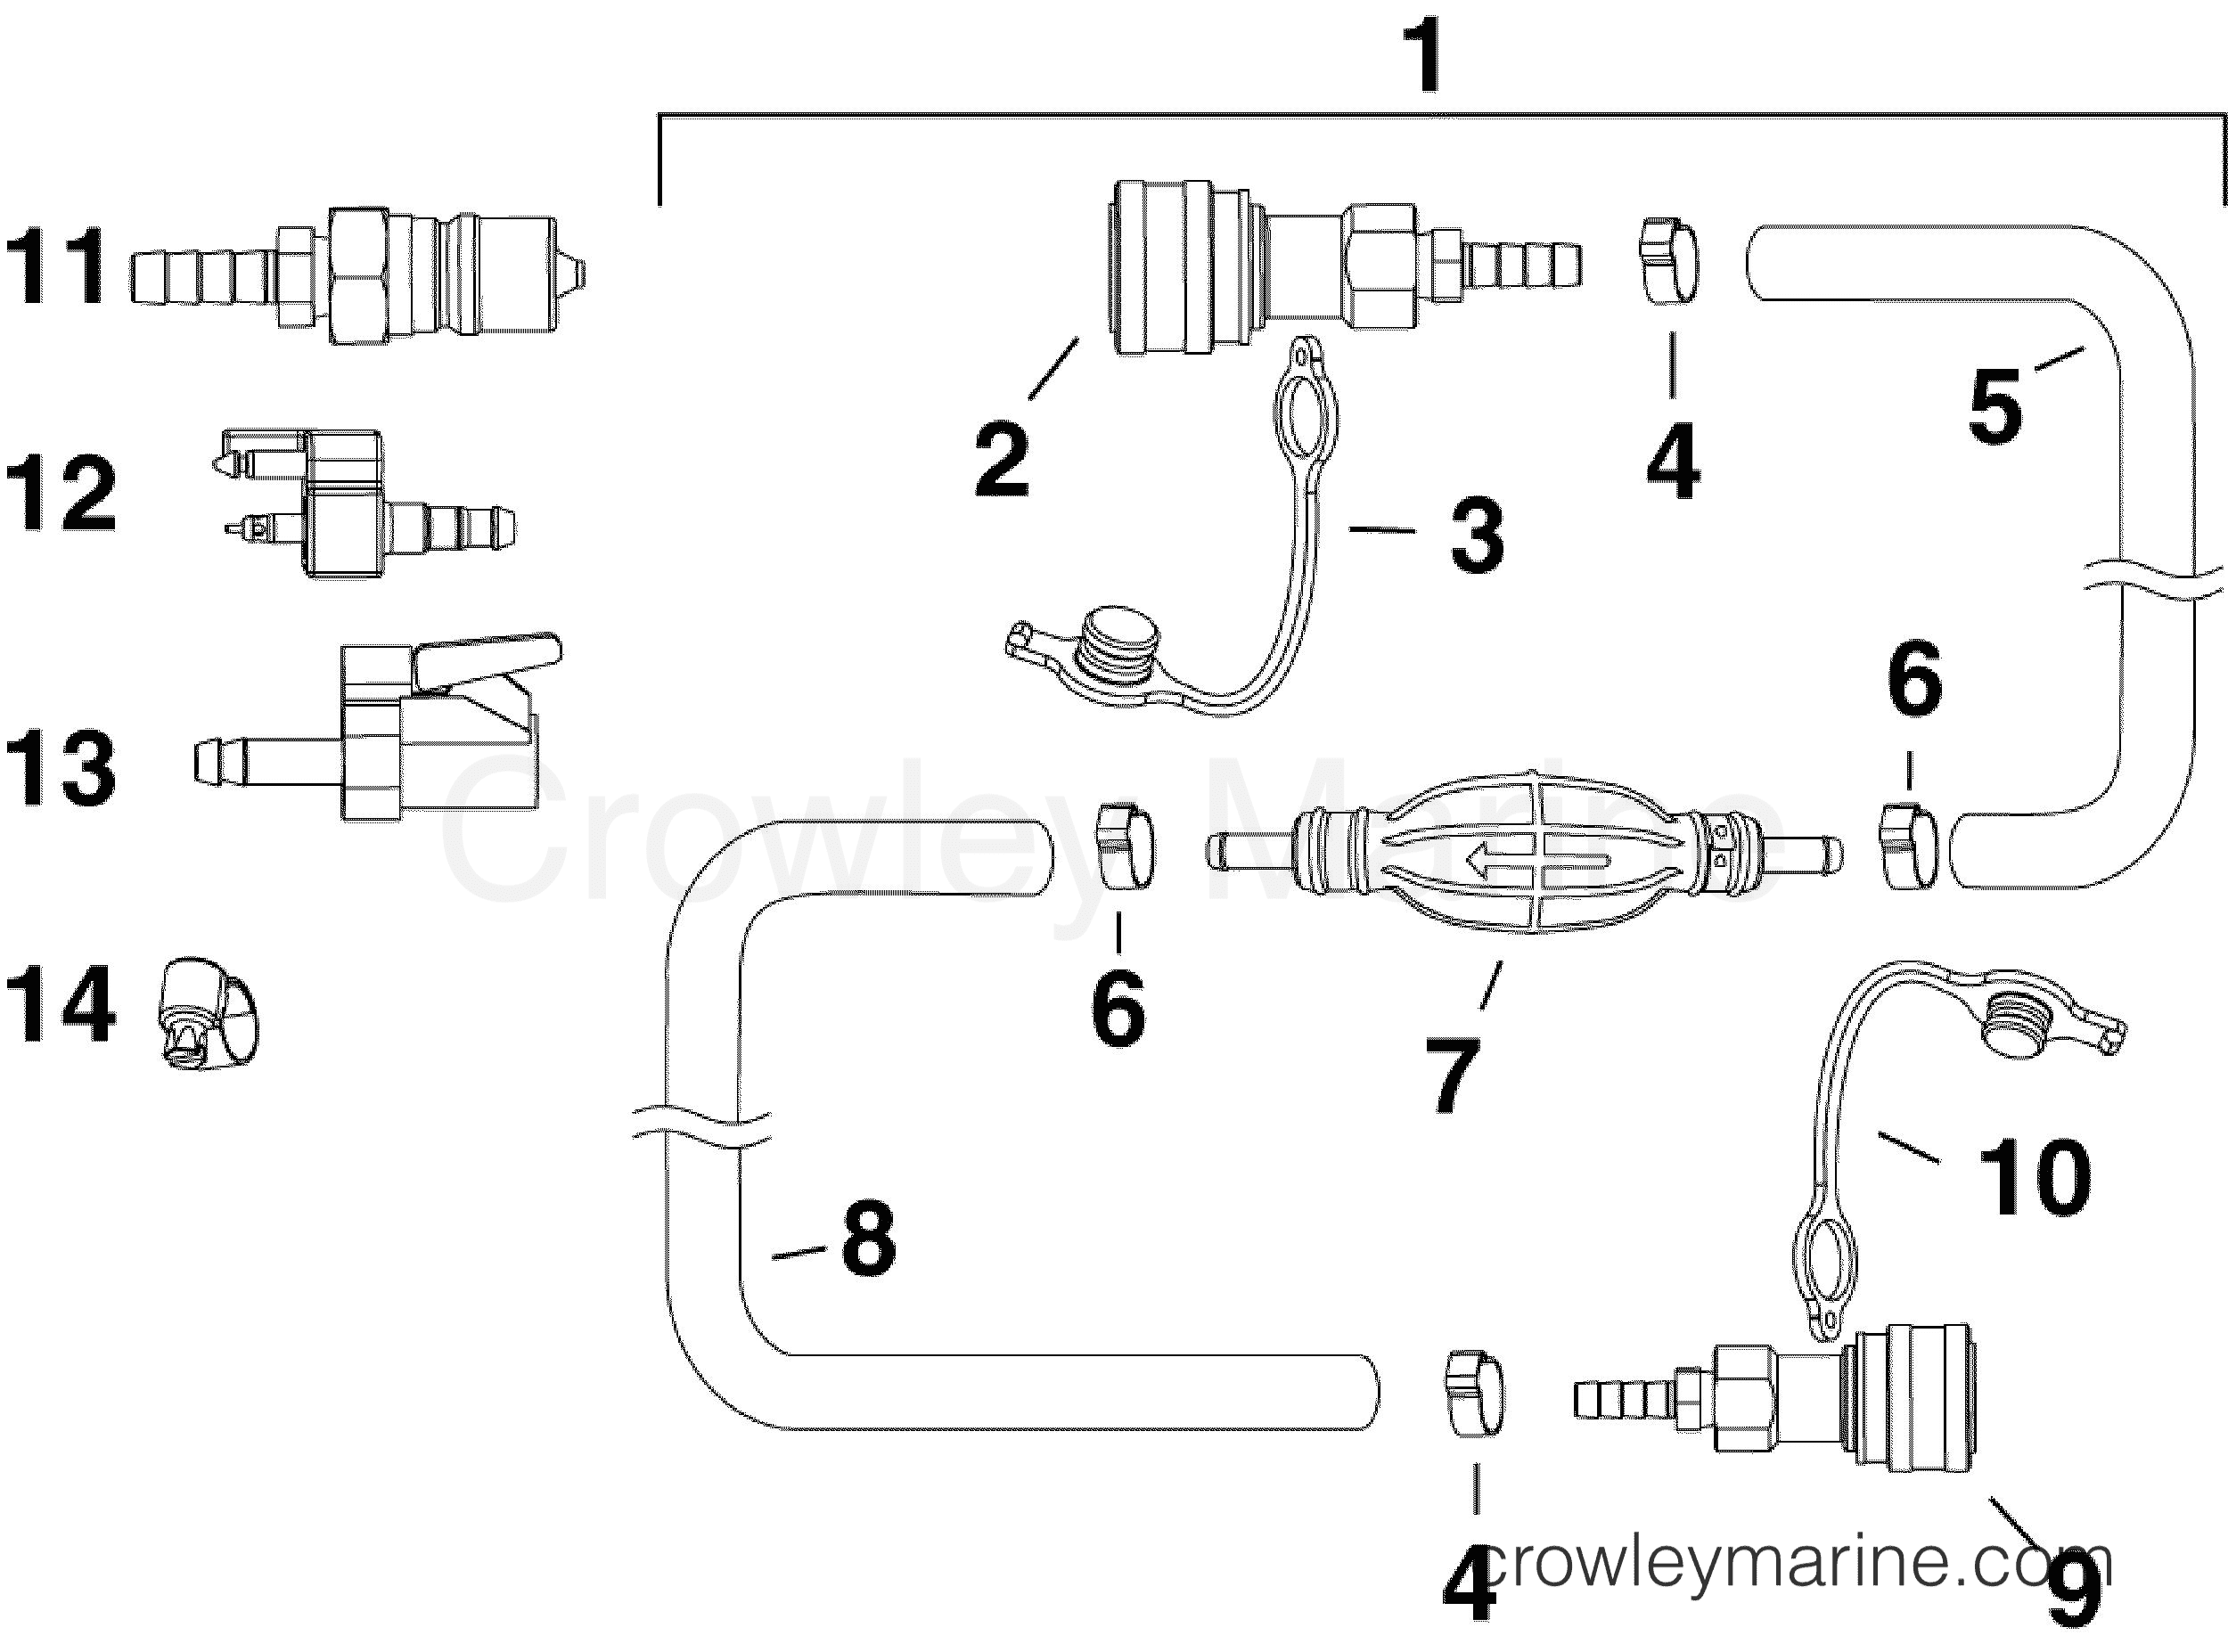 Poulan Chainsaw Primer Diagram 2150 Carburetor Wire Craftsman Wiring Bulb Residential Electrical Symbols U2022 Gas Line Fuel Hose